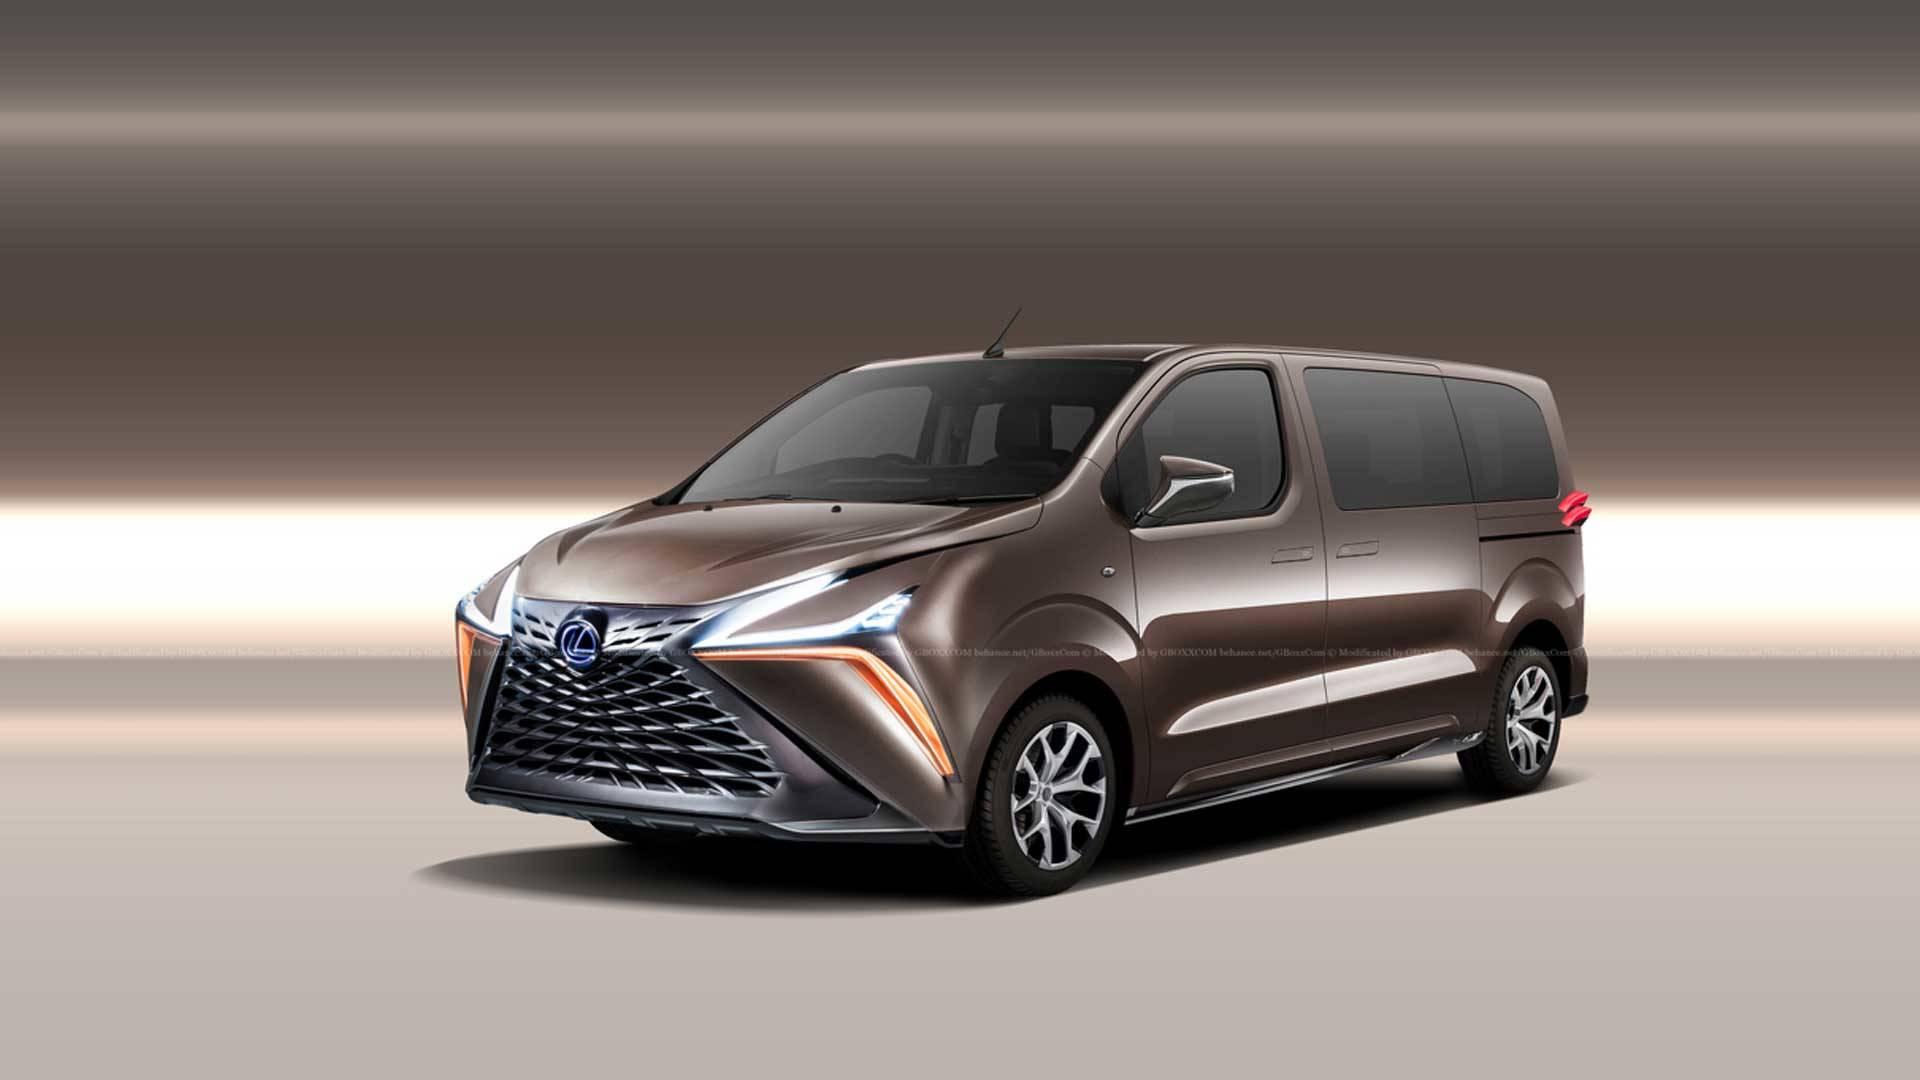 What If BMW Alfa Romeo And Subaru Sold Full Size Vans [UPDATE]